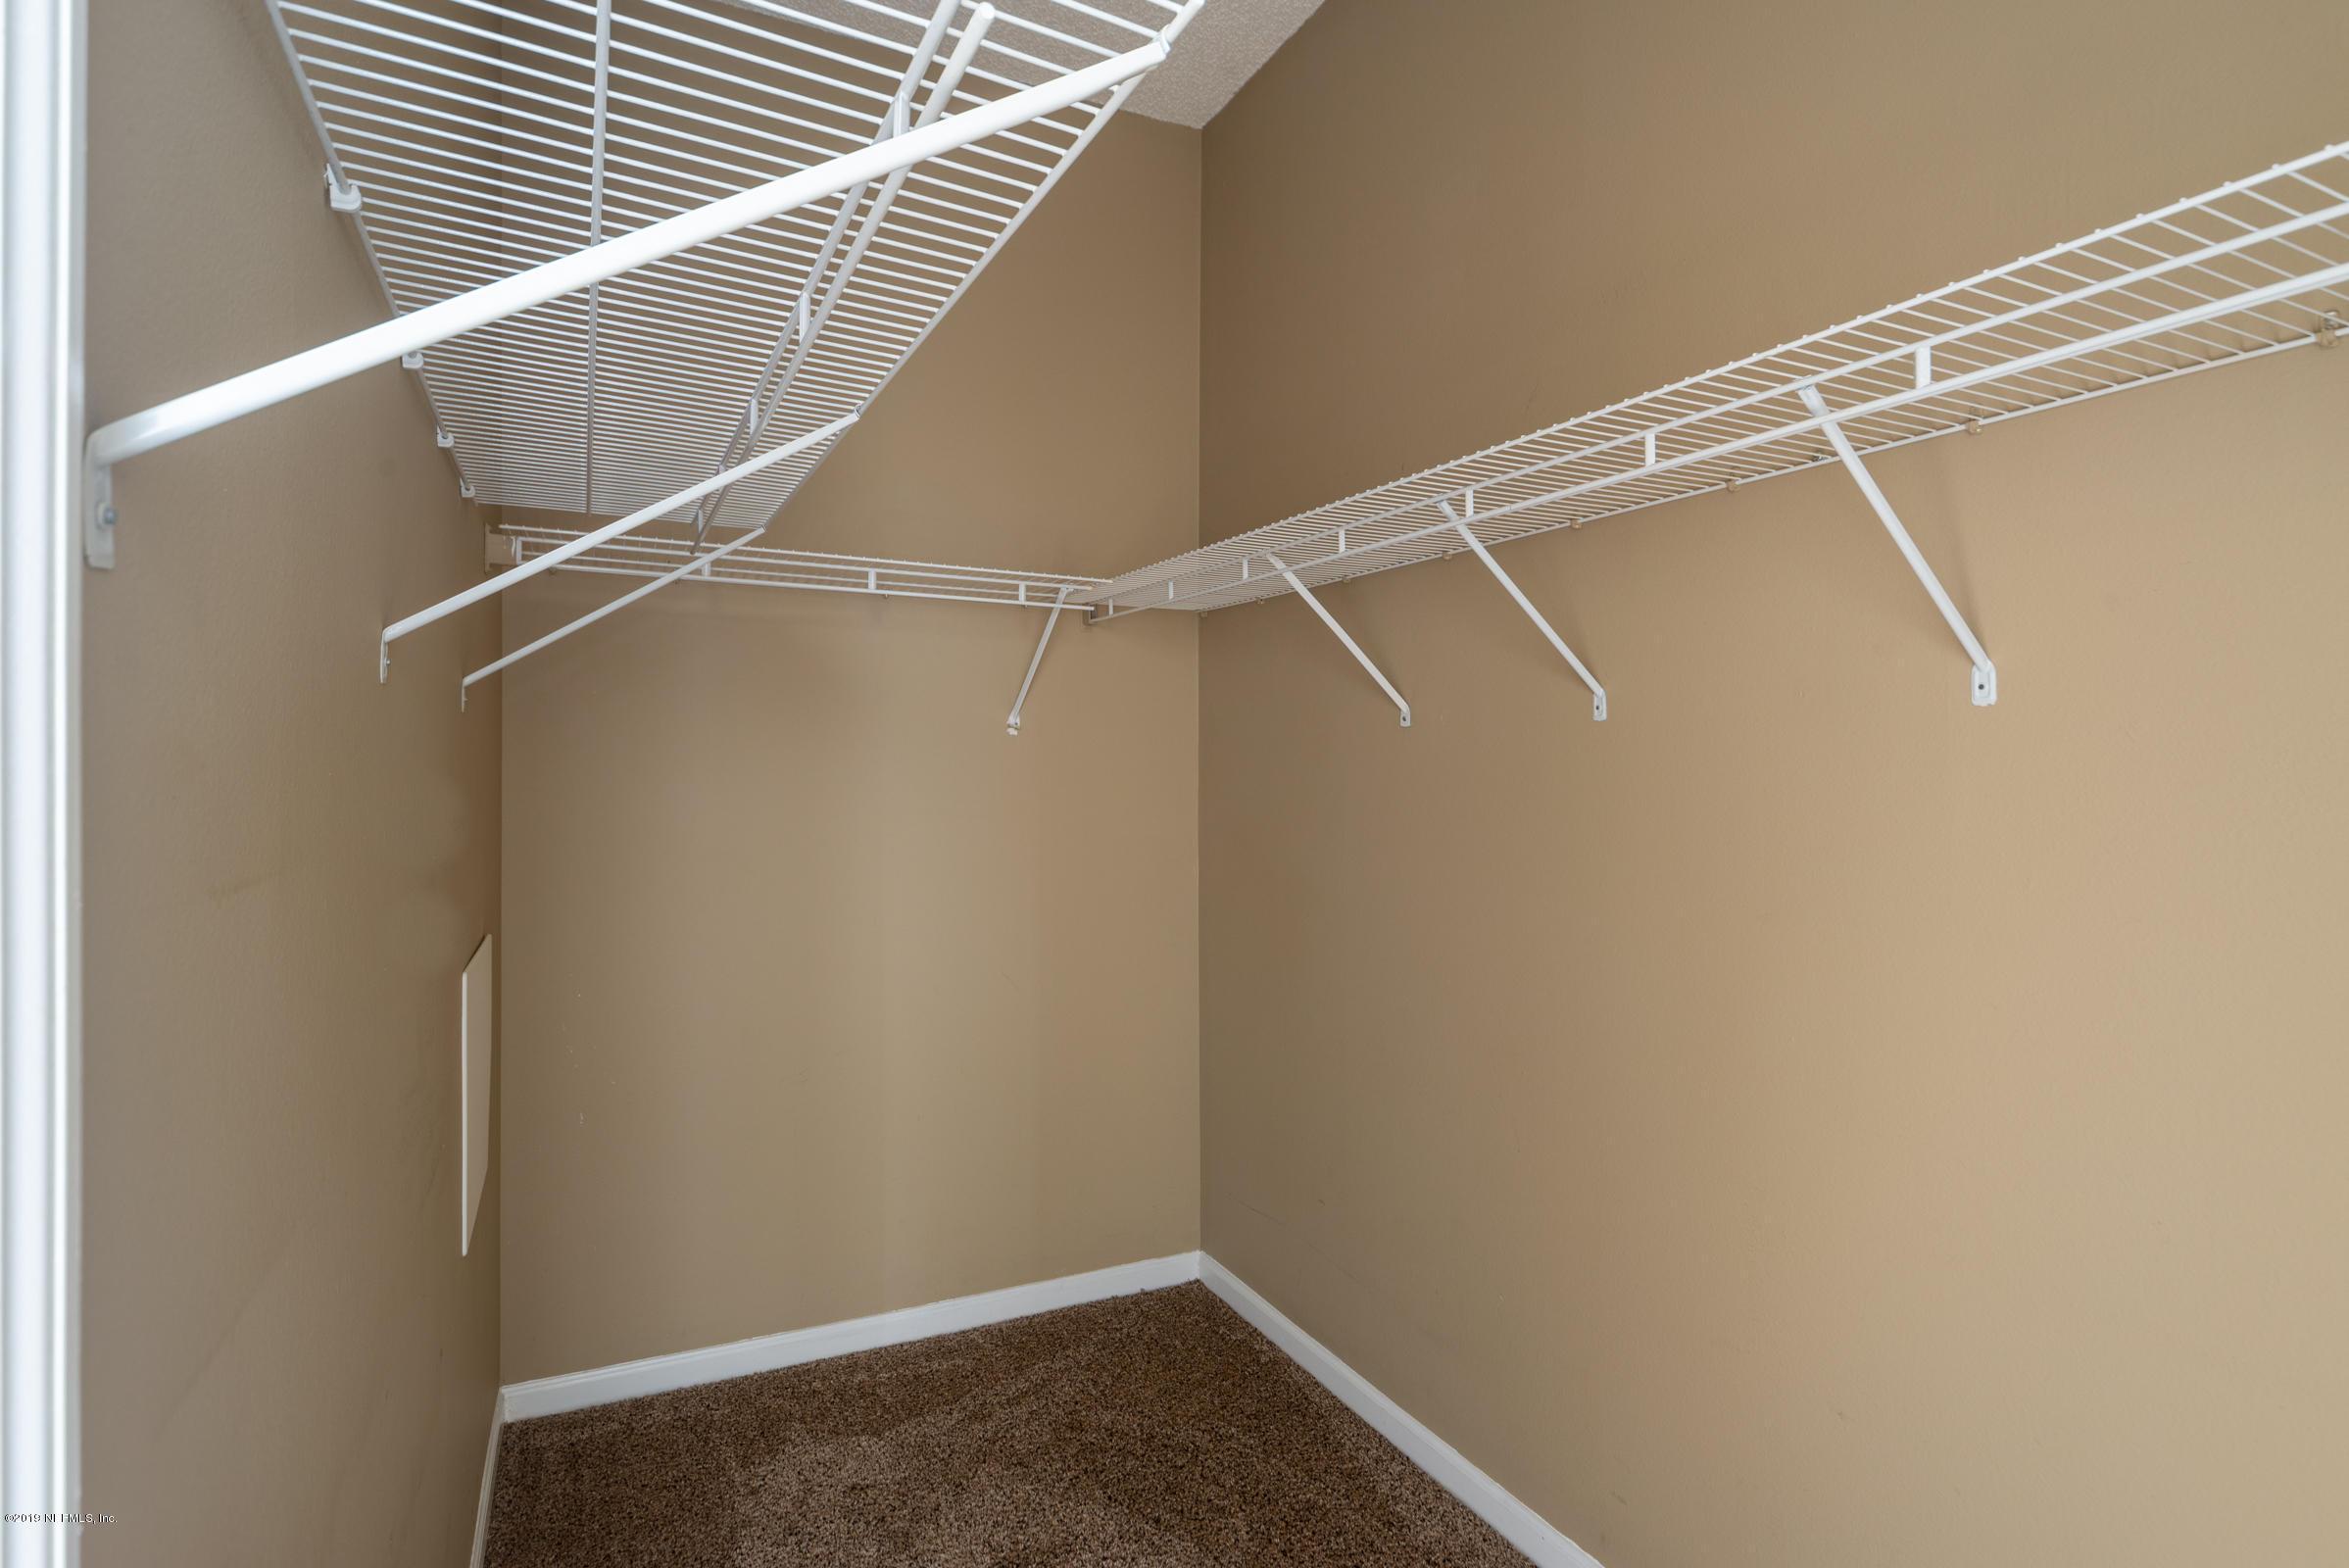 1005 BELLA VISTA, ST AUGUSTINE, FLORIDA 32084, 2 Bedrooms Bedrooms, ,2 BathroomsBathrooms,Condo,For sale,BELLA VISTA,1016248